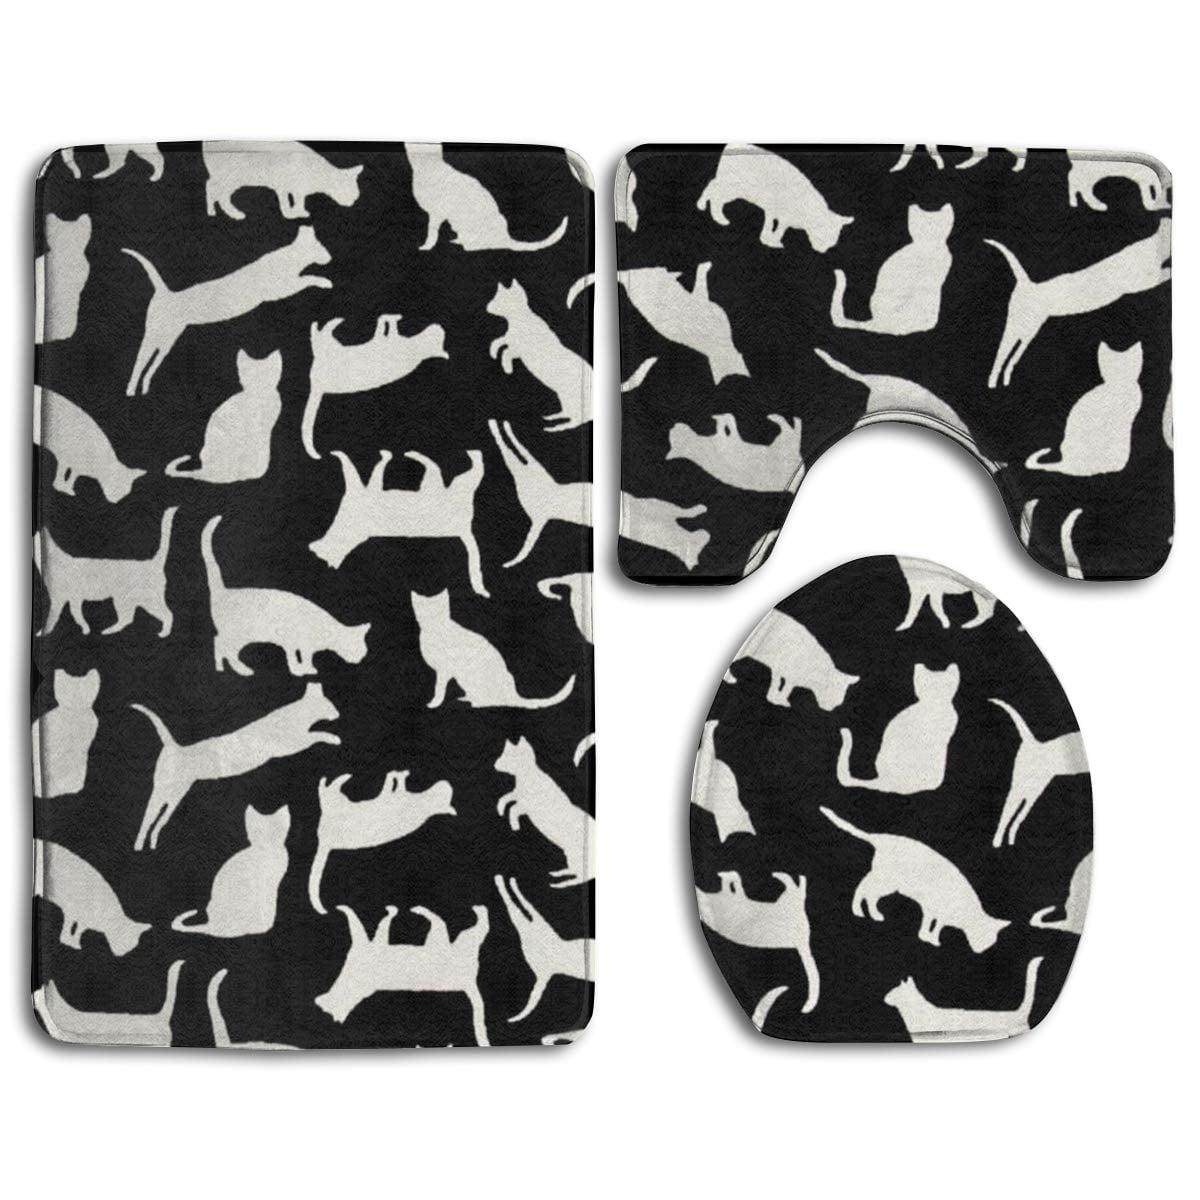 Pudmad Black Cute Cat Kittens 3 Piece Bathroom Rugs Set Bath Rug Contour Mat And Toilet Lid Cover Walmart Com Walmart Com